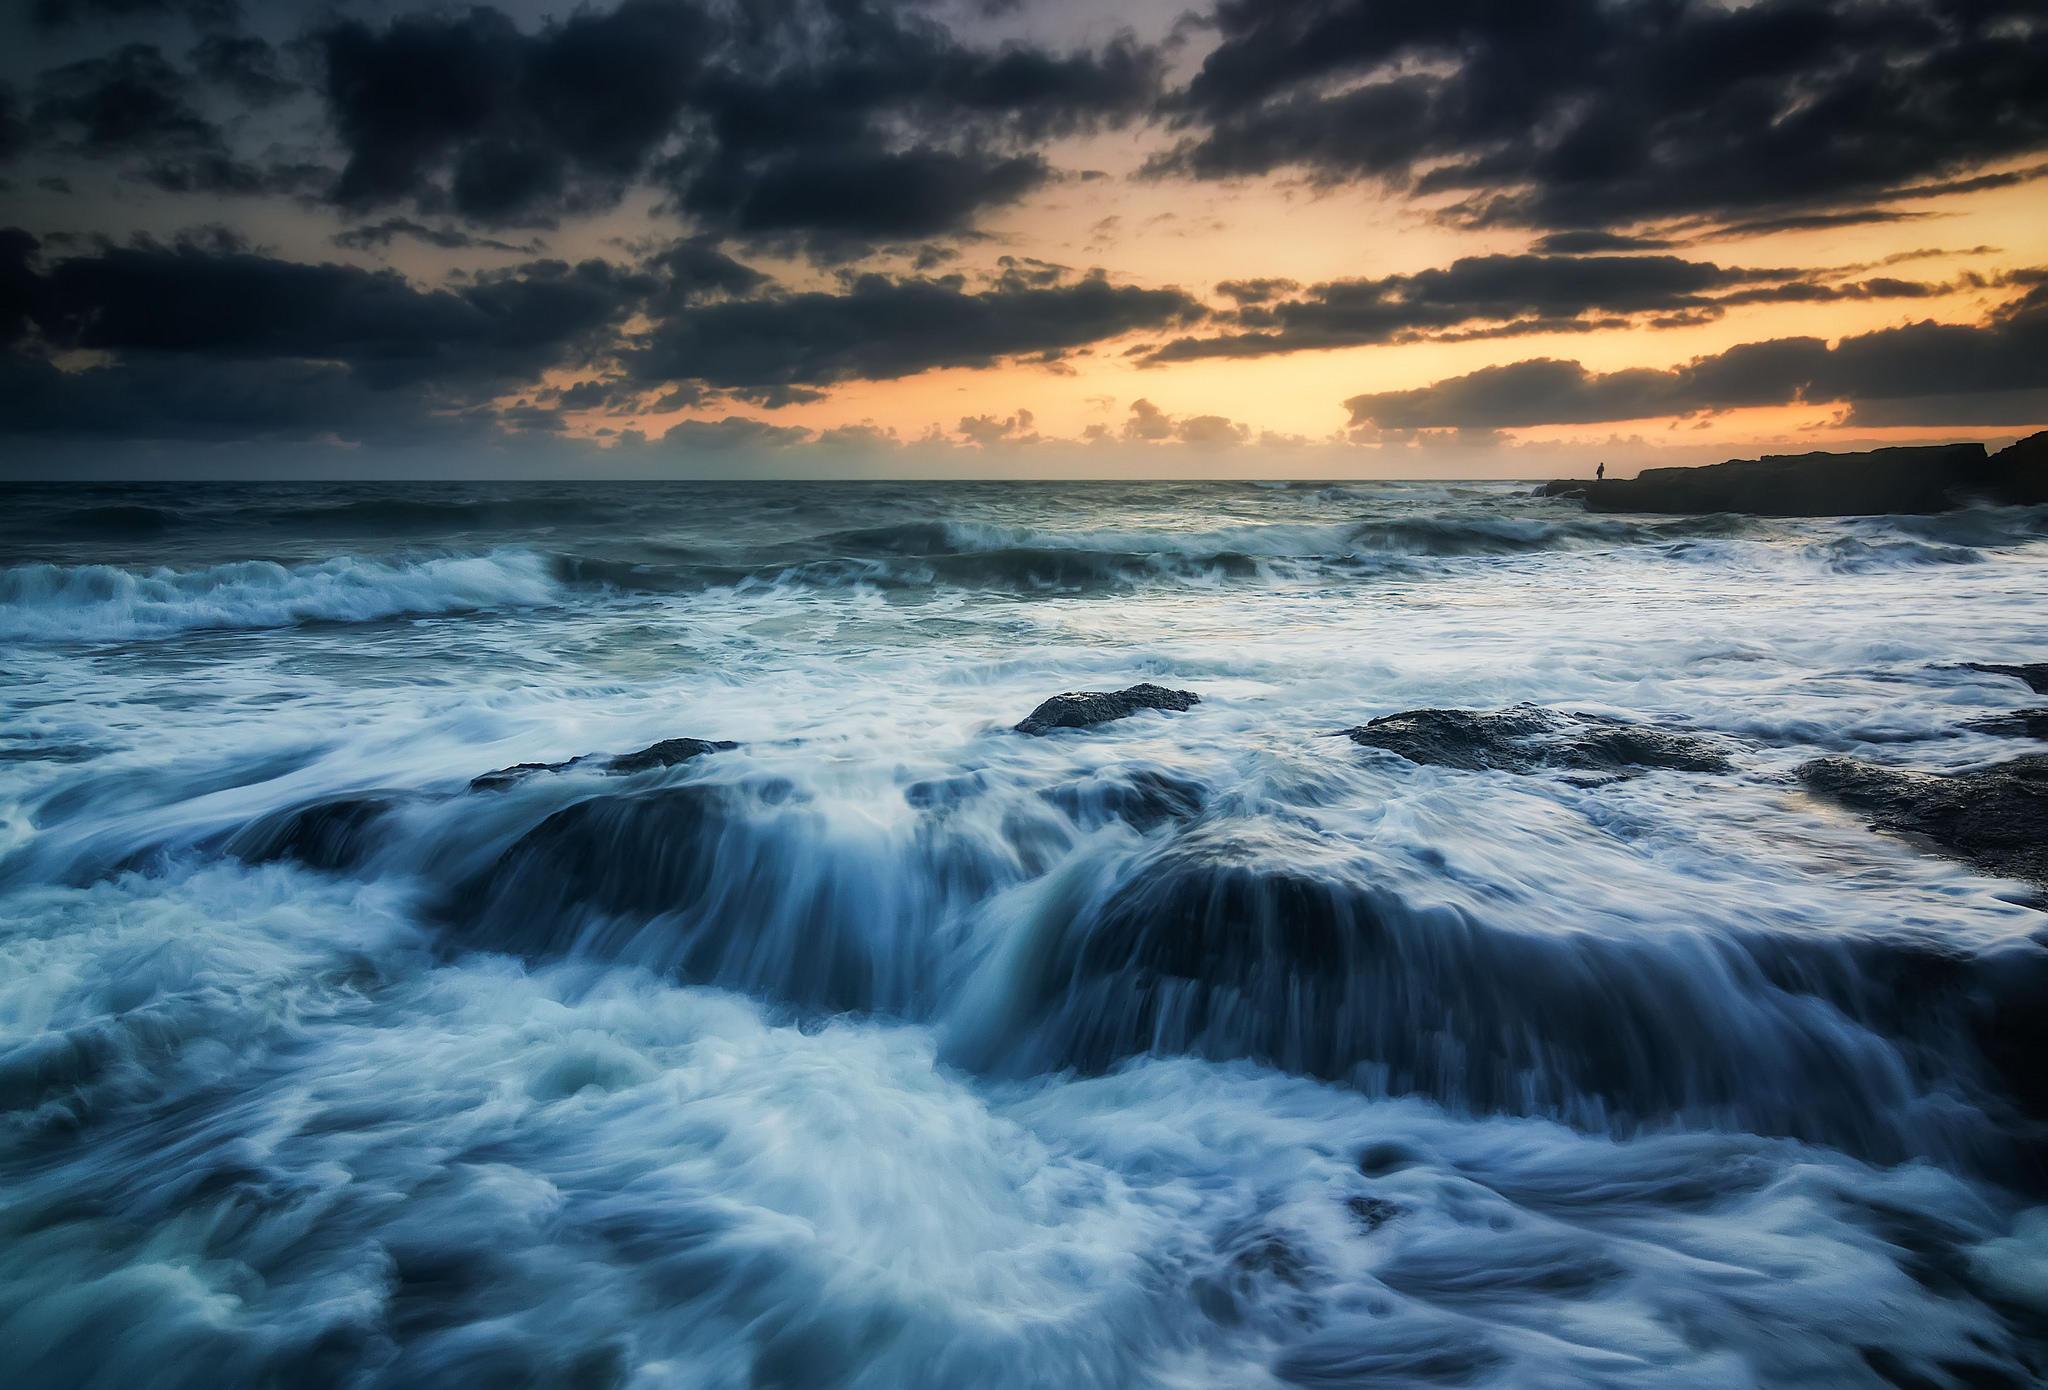 море, влны, берег, пляж, пейзаж